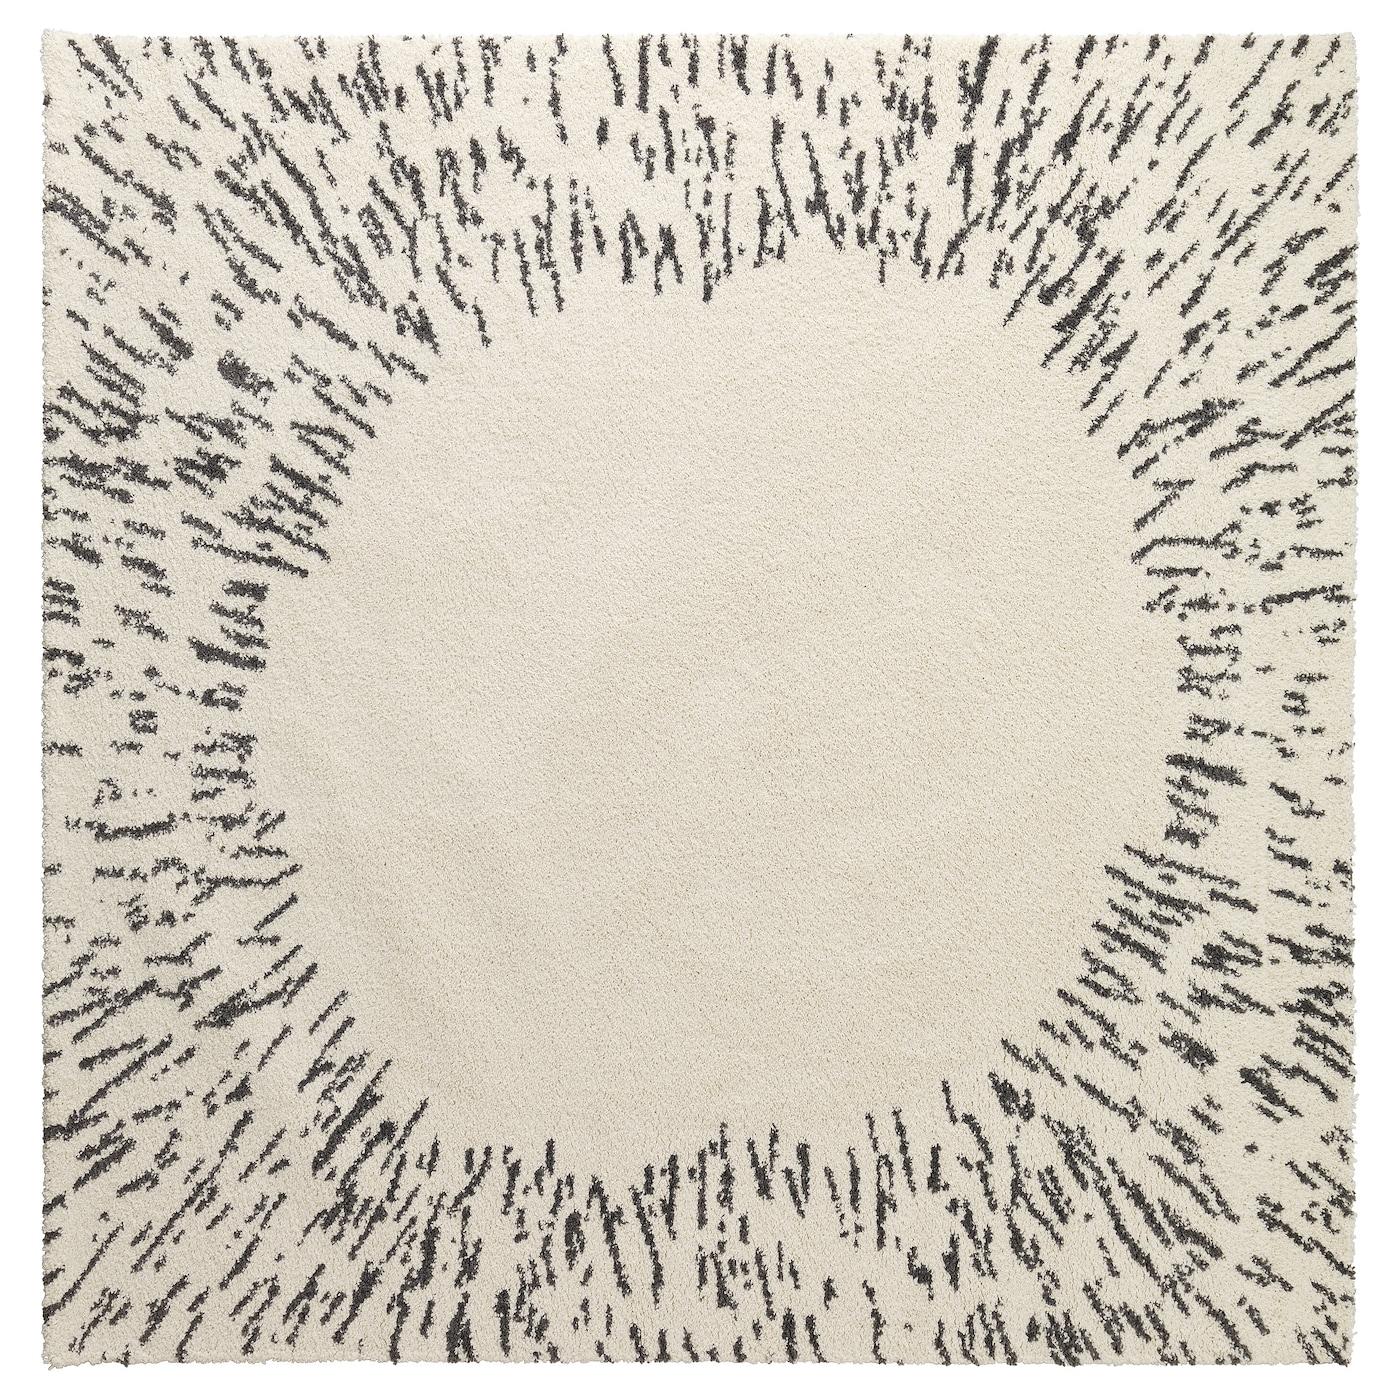 sanderum rug high pile white grey 200x200 cm ikea. Black Bedroom Furniture Sets. Home Design Ideas